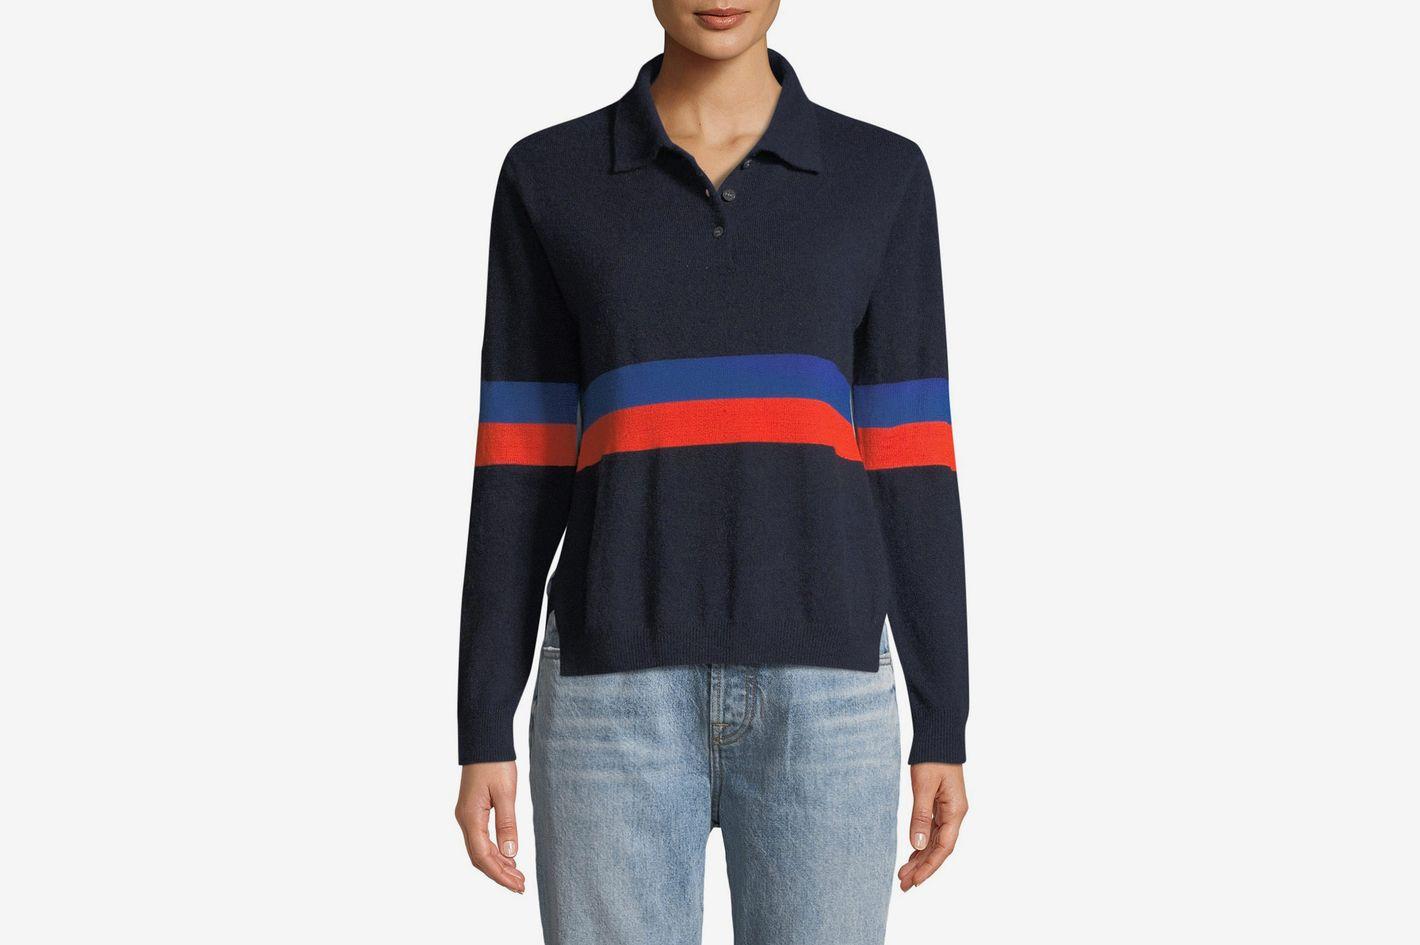 Kule Rainey Long-Sleeve Cashmere Combo Top